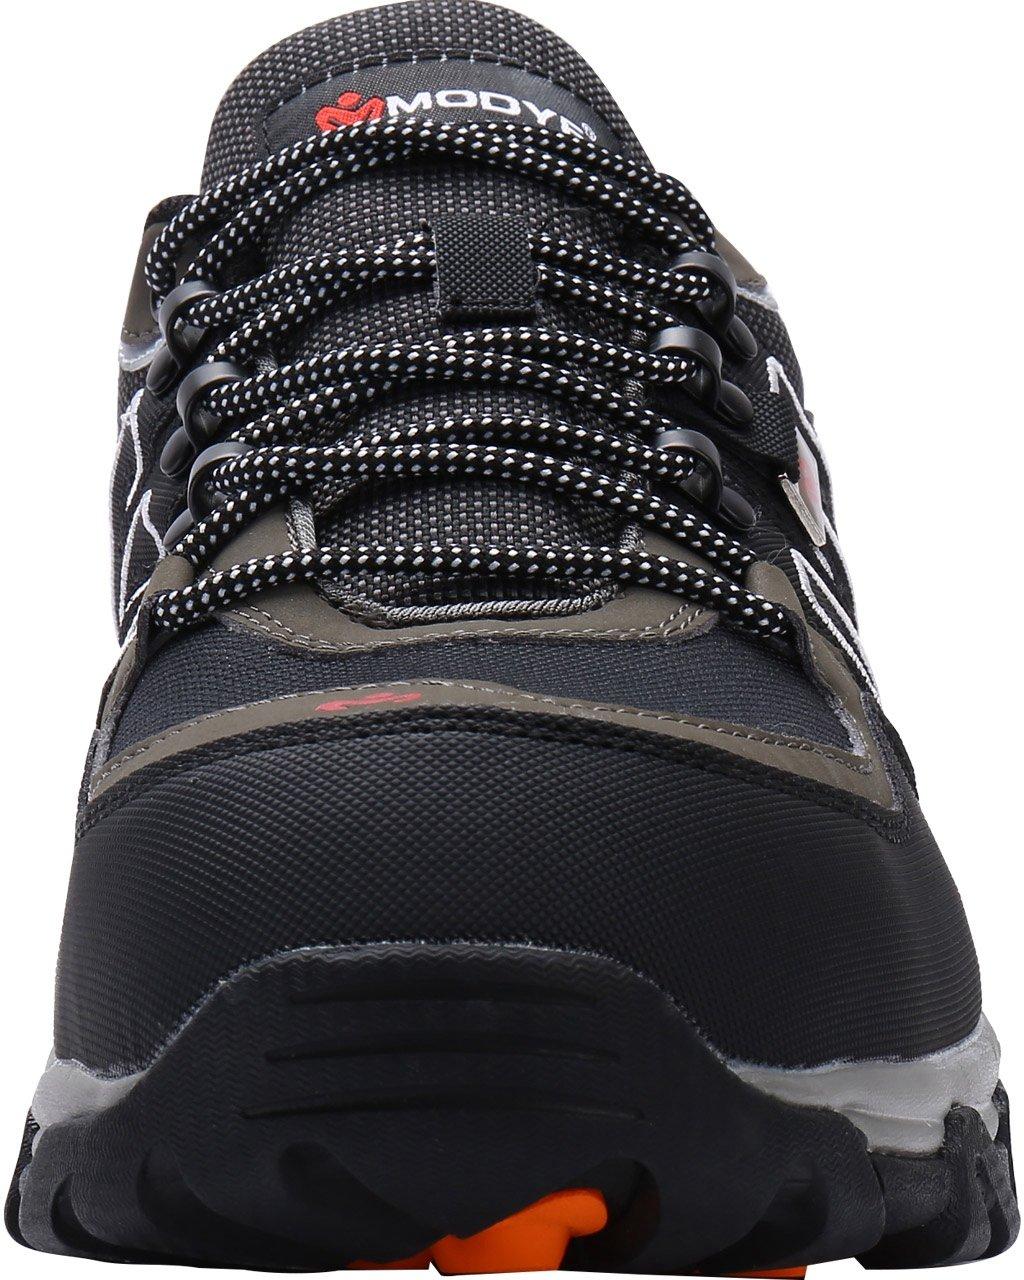 MODYF Steel Toe Work Safety Shoes